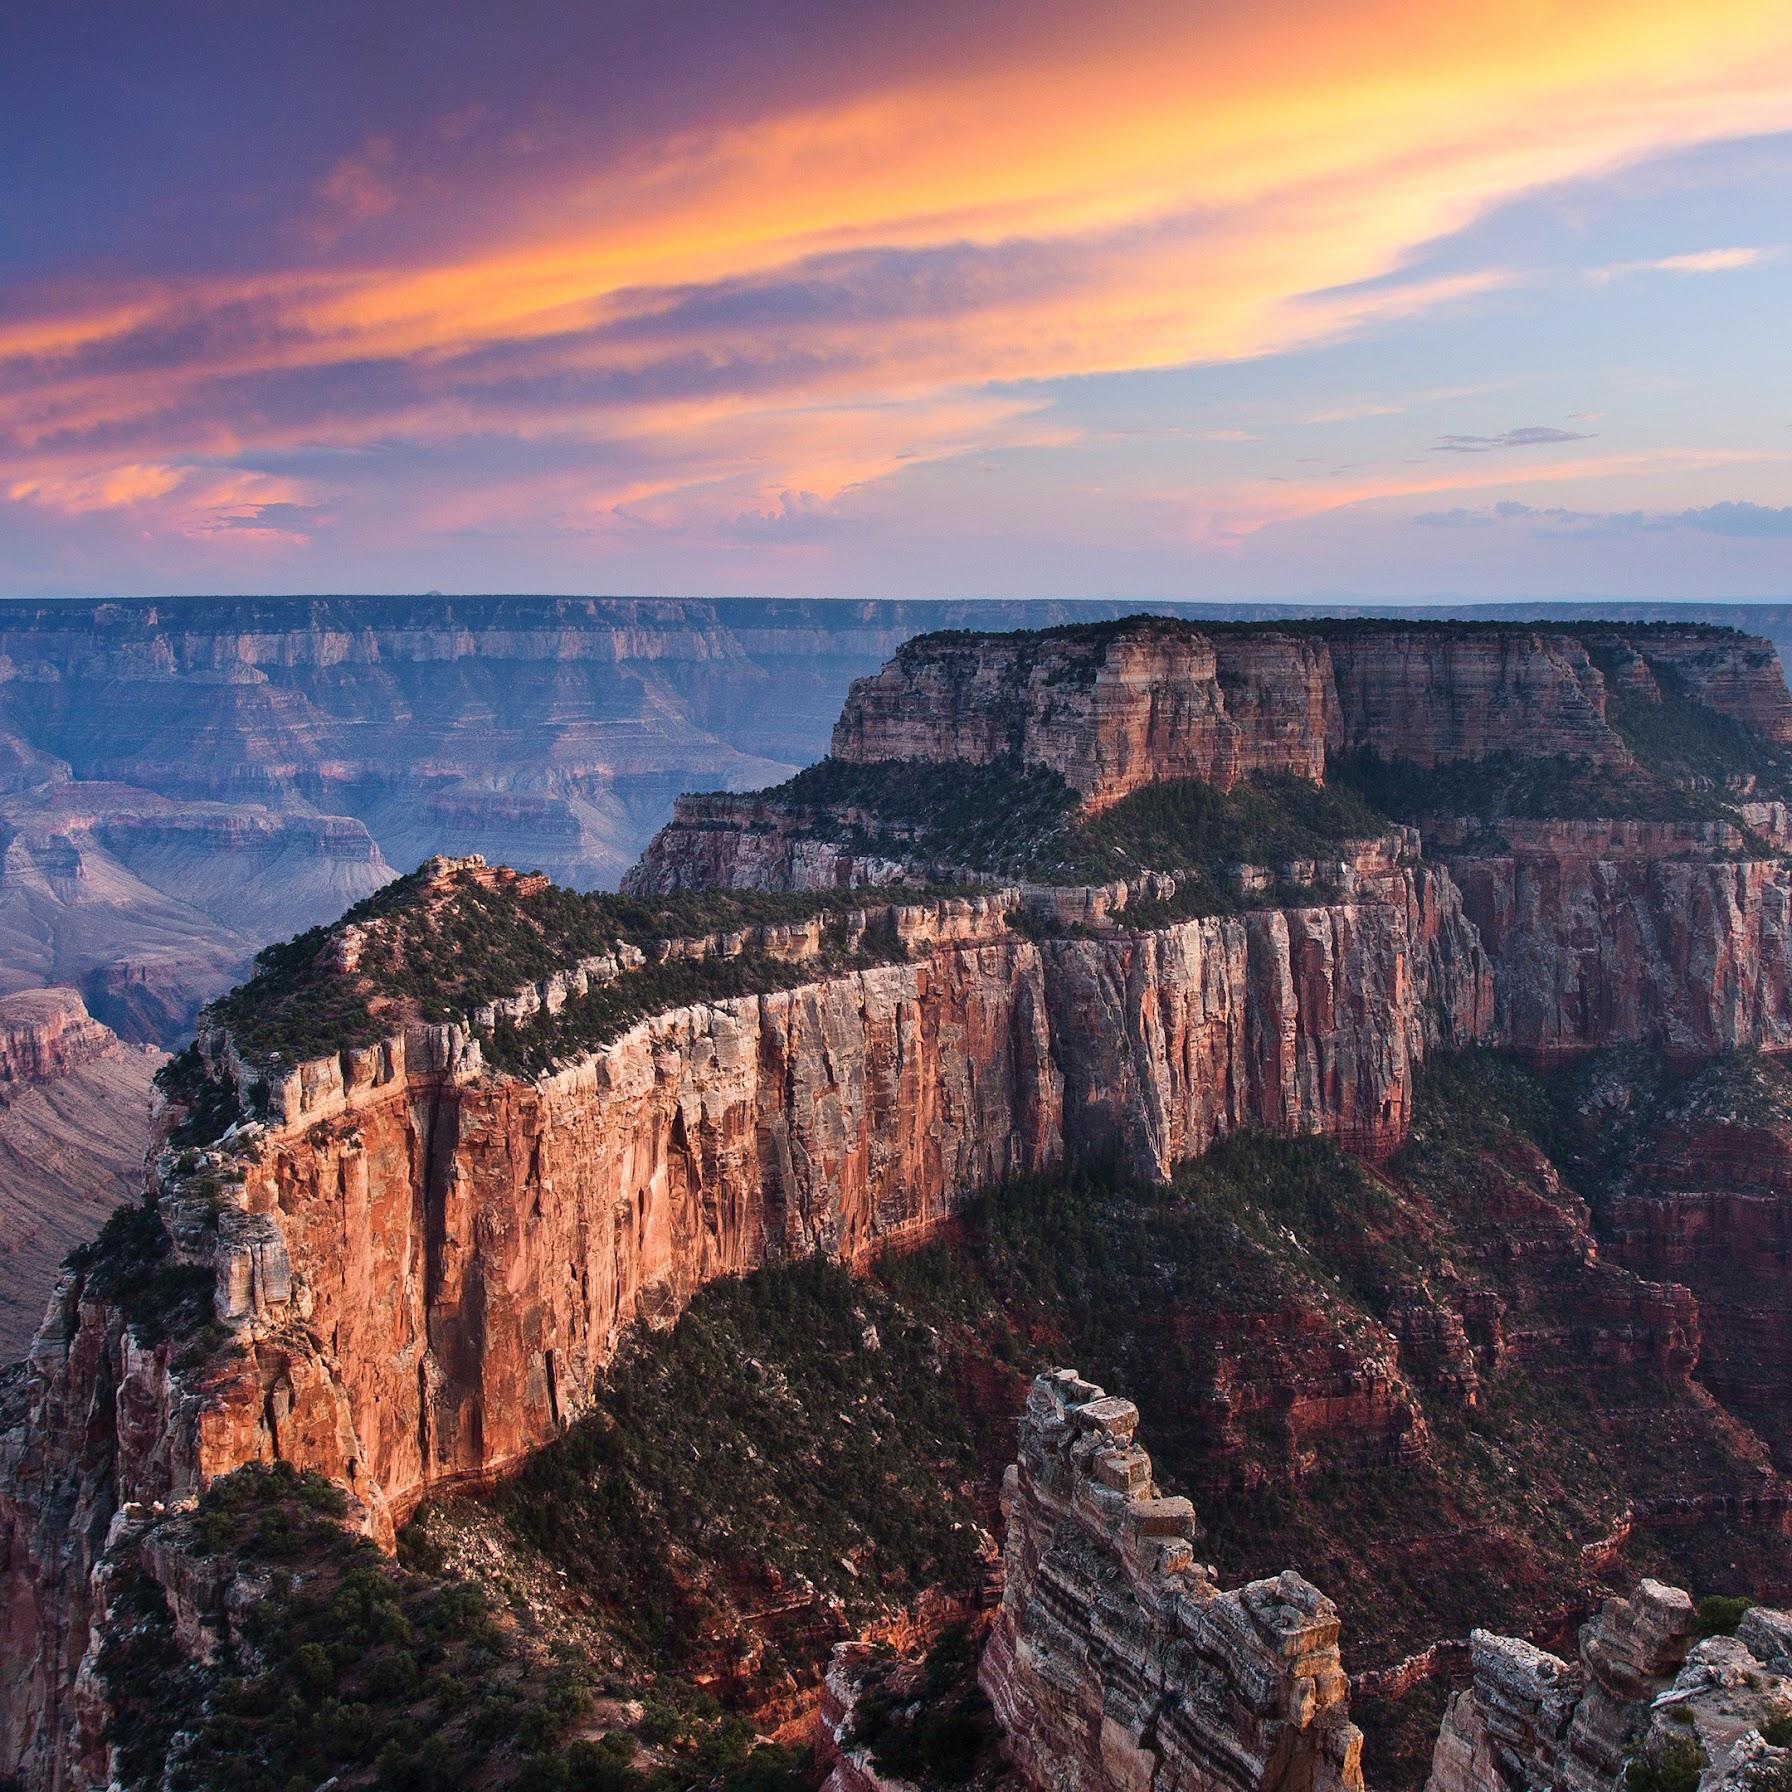 Grand Canyon National Park, Arizona, Landscape, Scenery